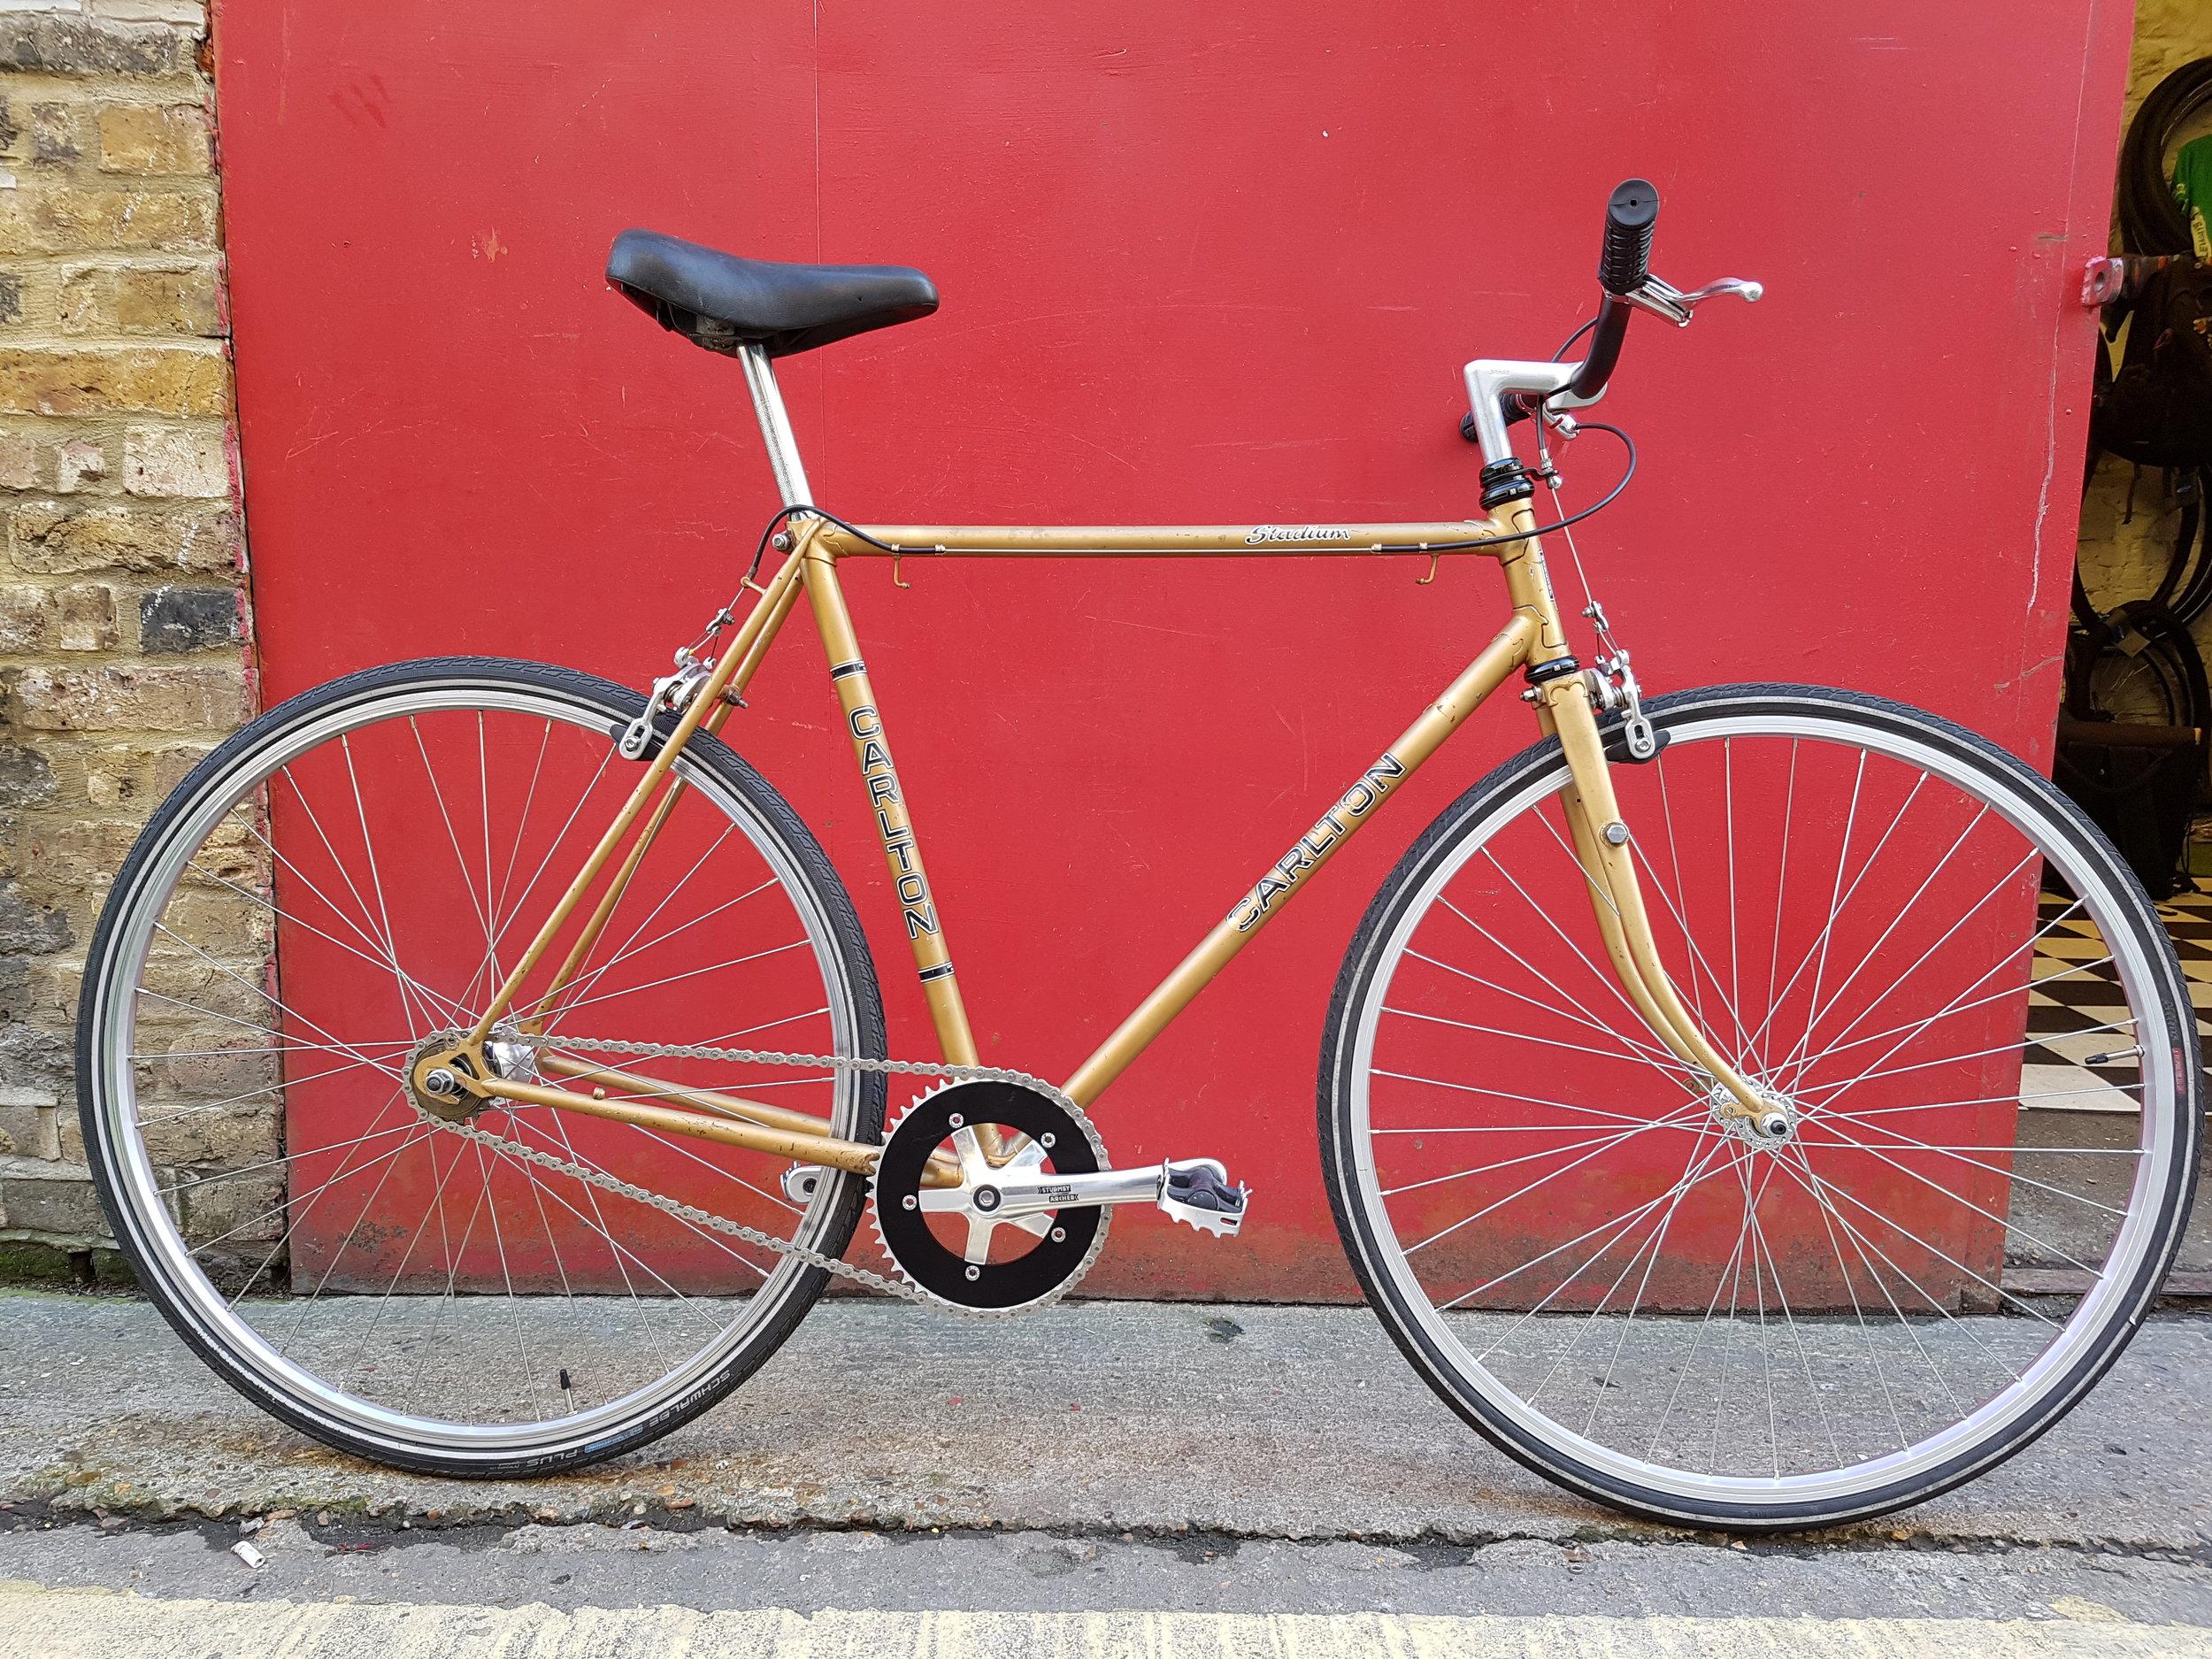 Bike shop review in London